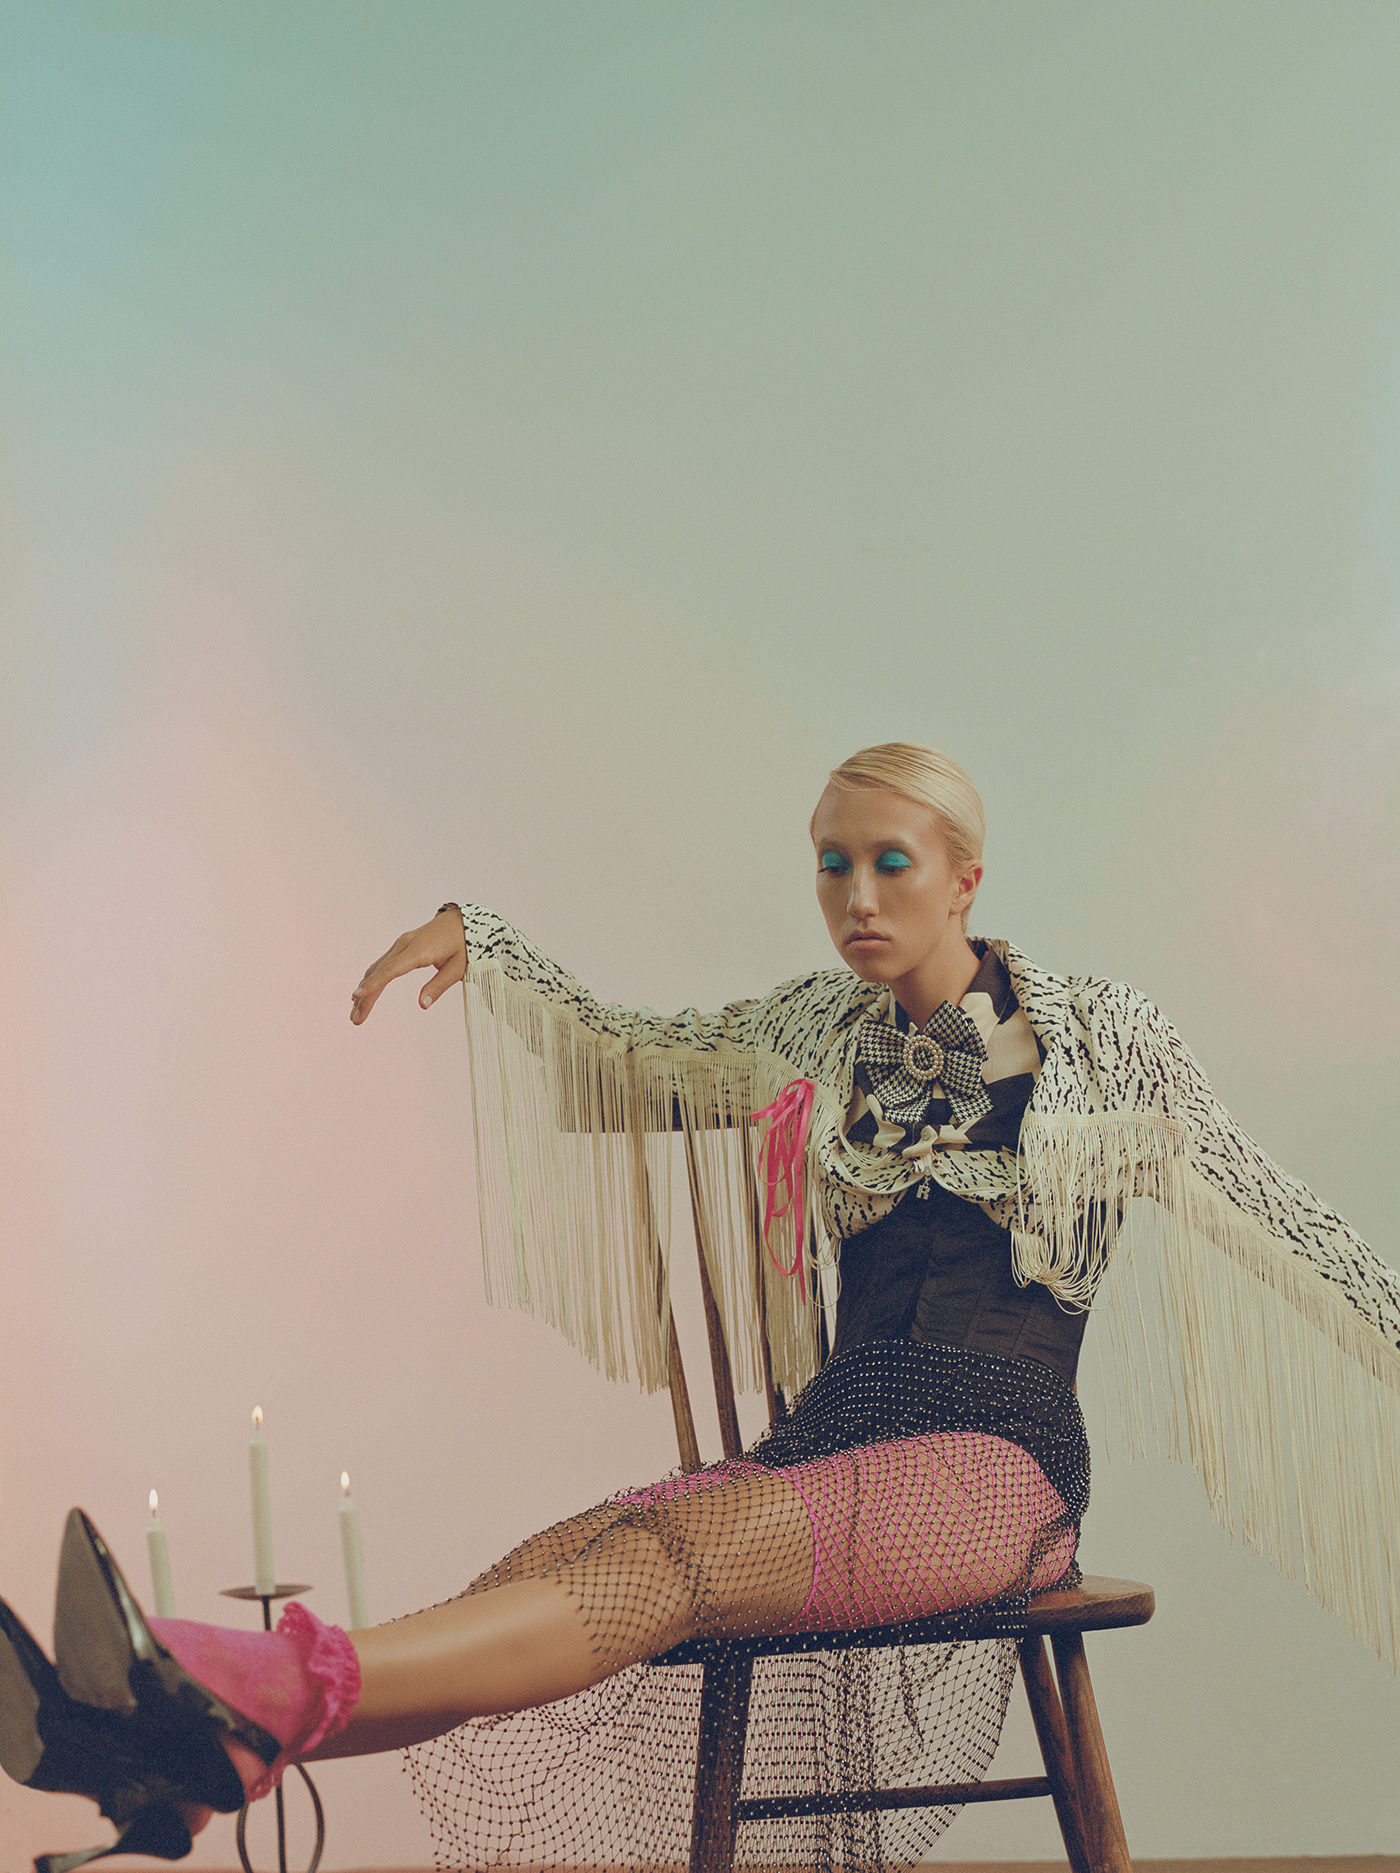 fashion editorial fashion photography film photography Pap Magazine